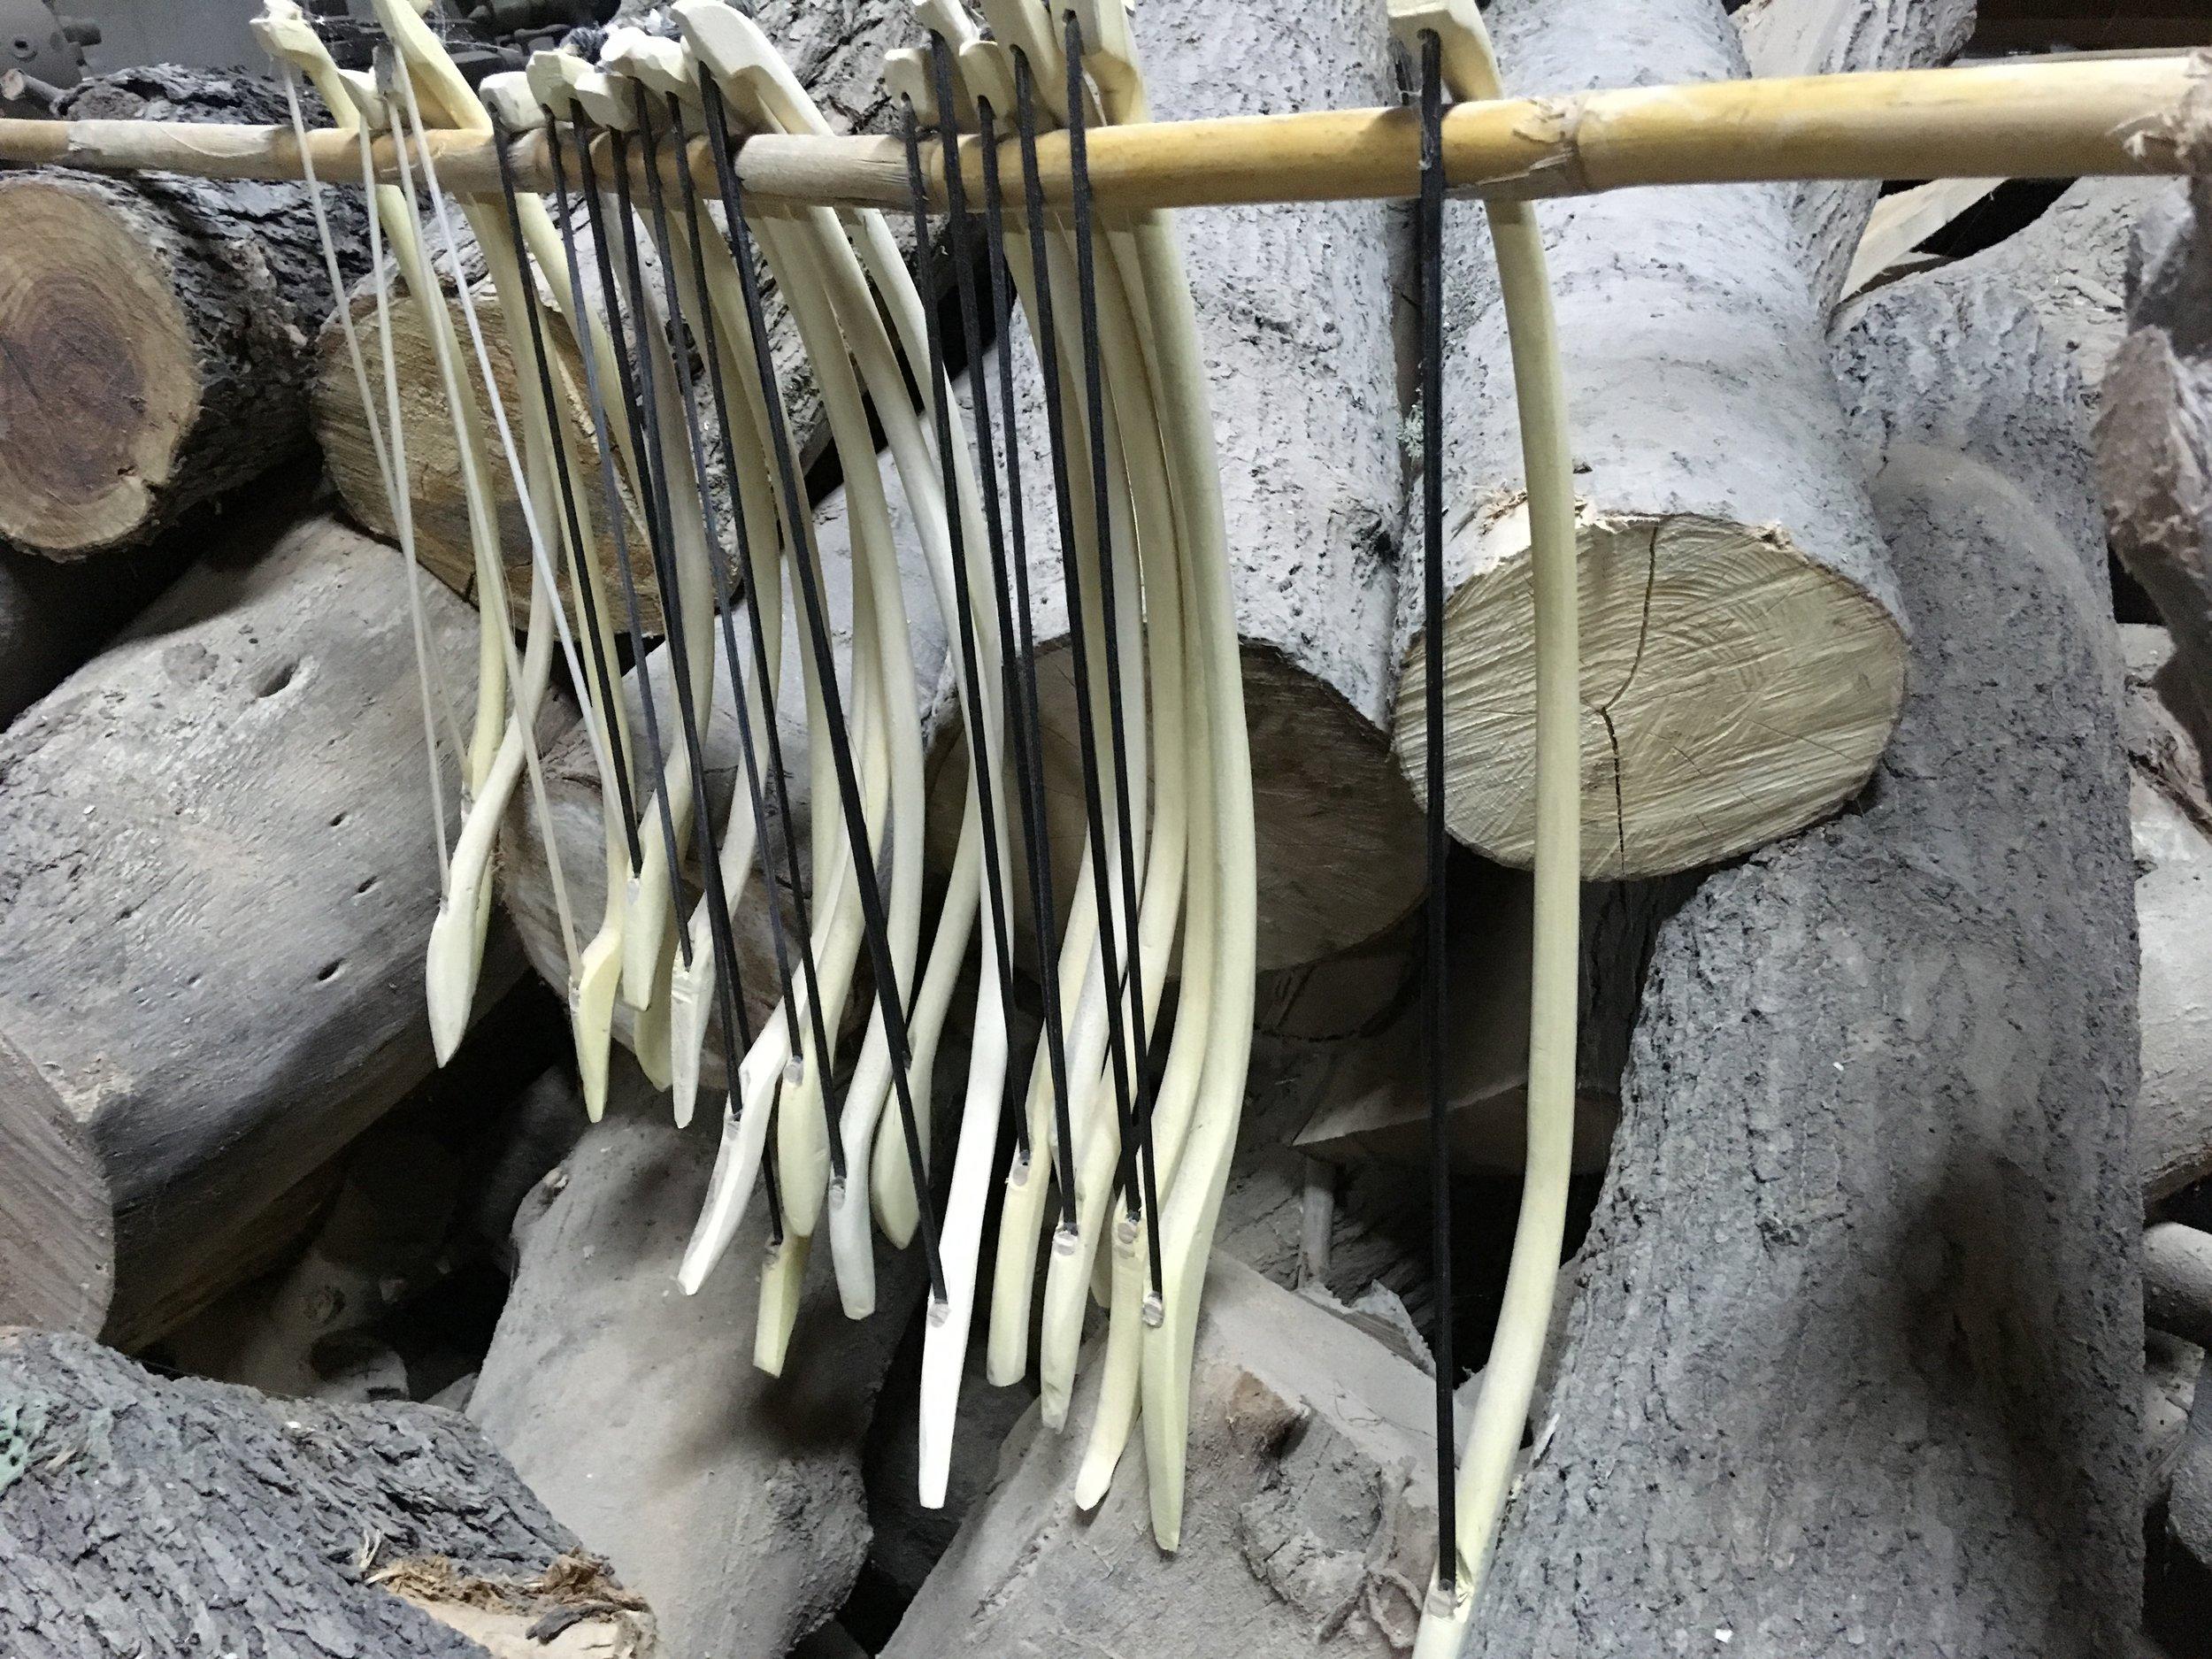 Bows in Francesco Siviglia's laboratory, Bova Marina, Calabria, Italy